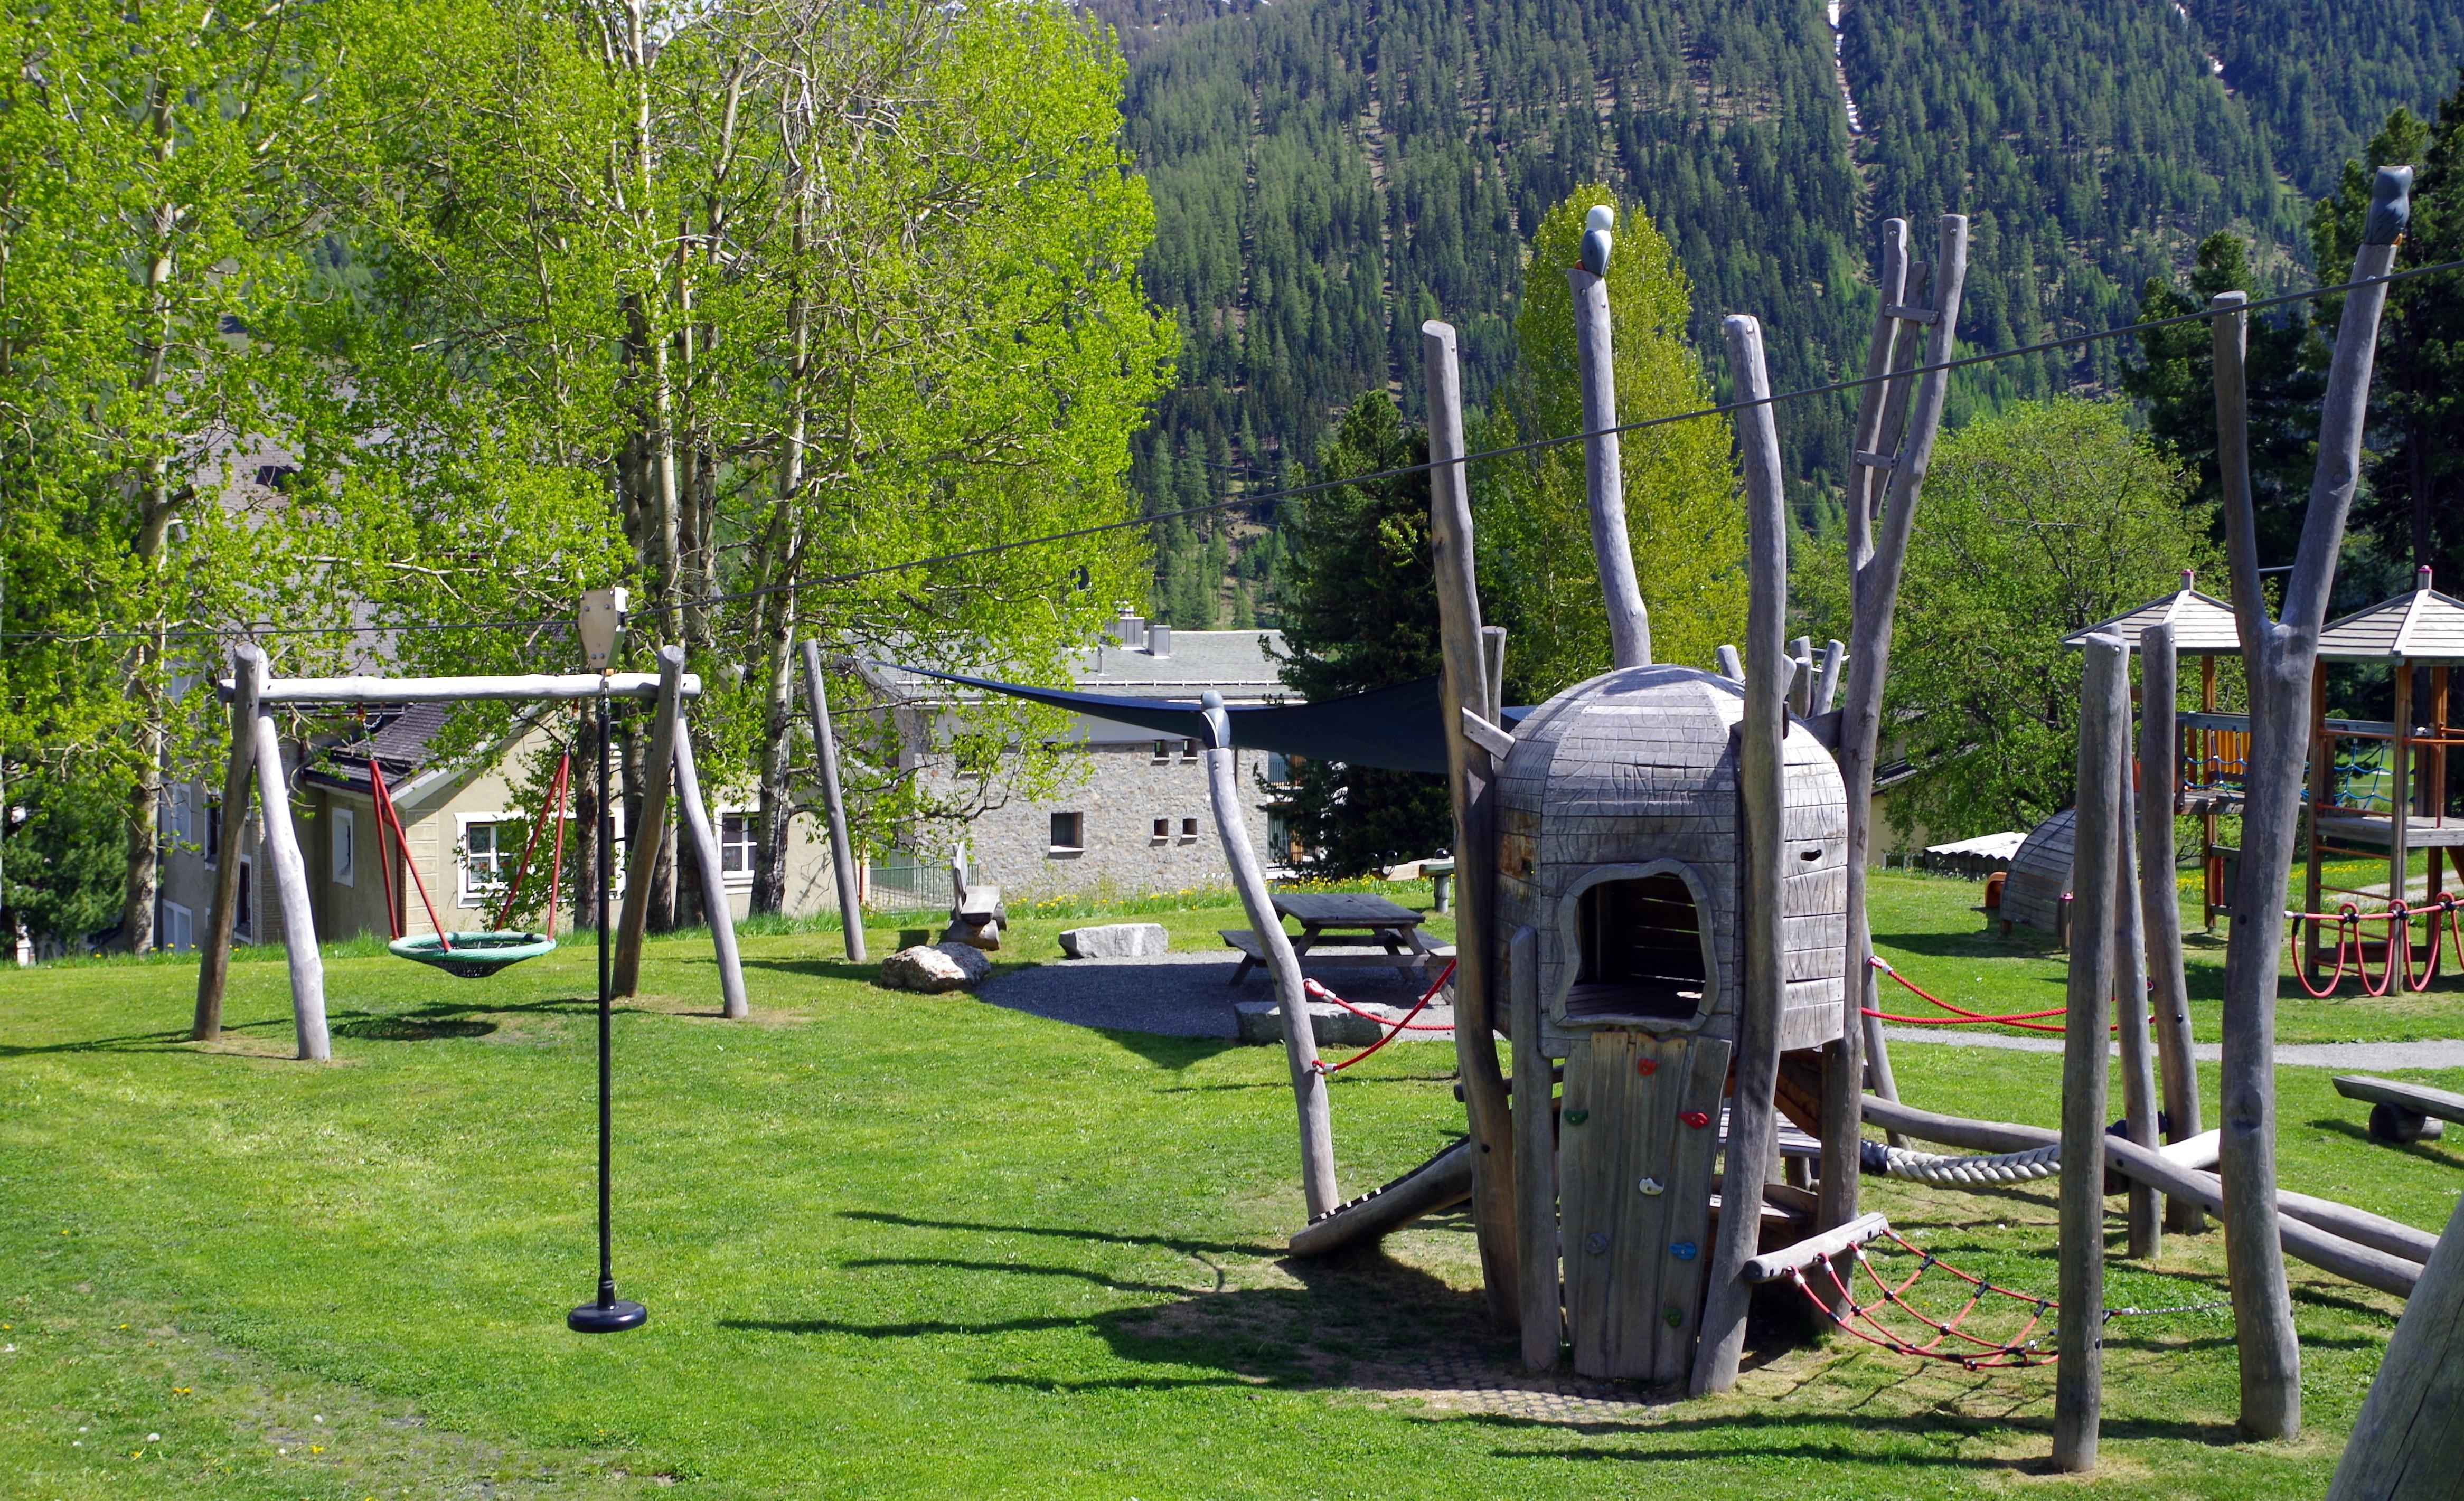 Kinderspielplatz Eulalia Slide 3